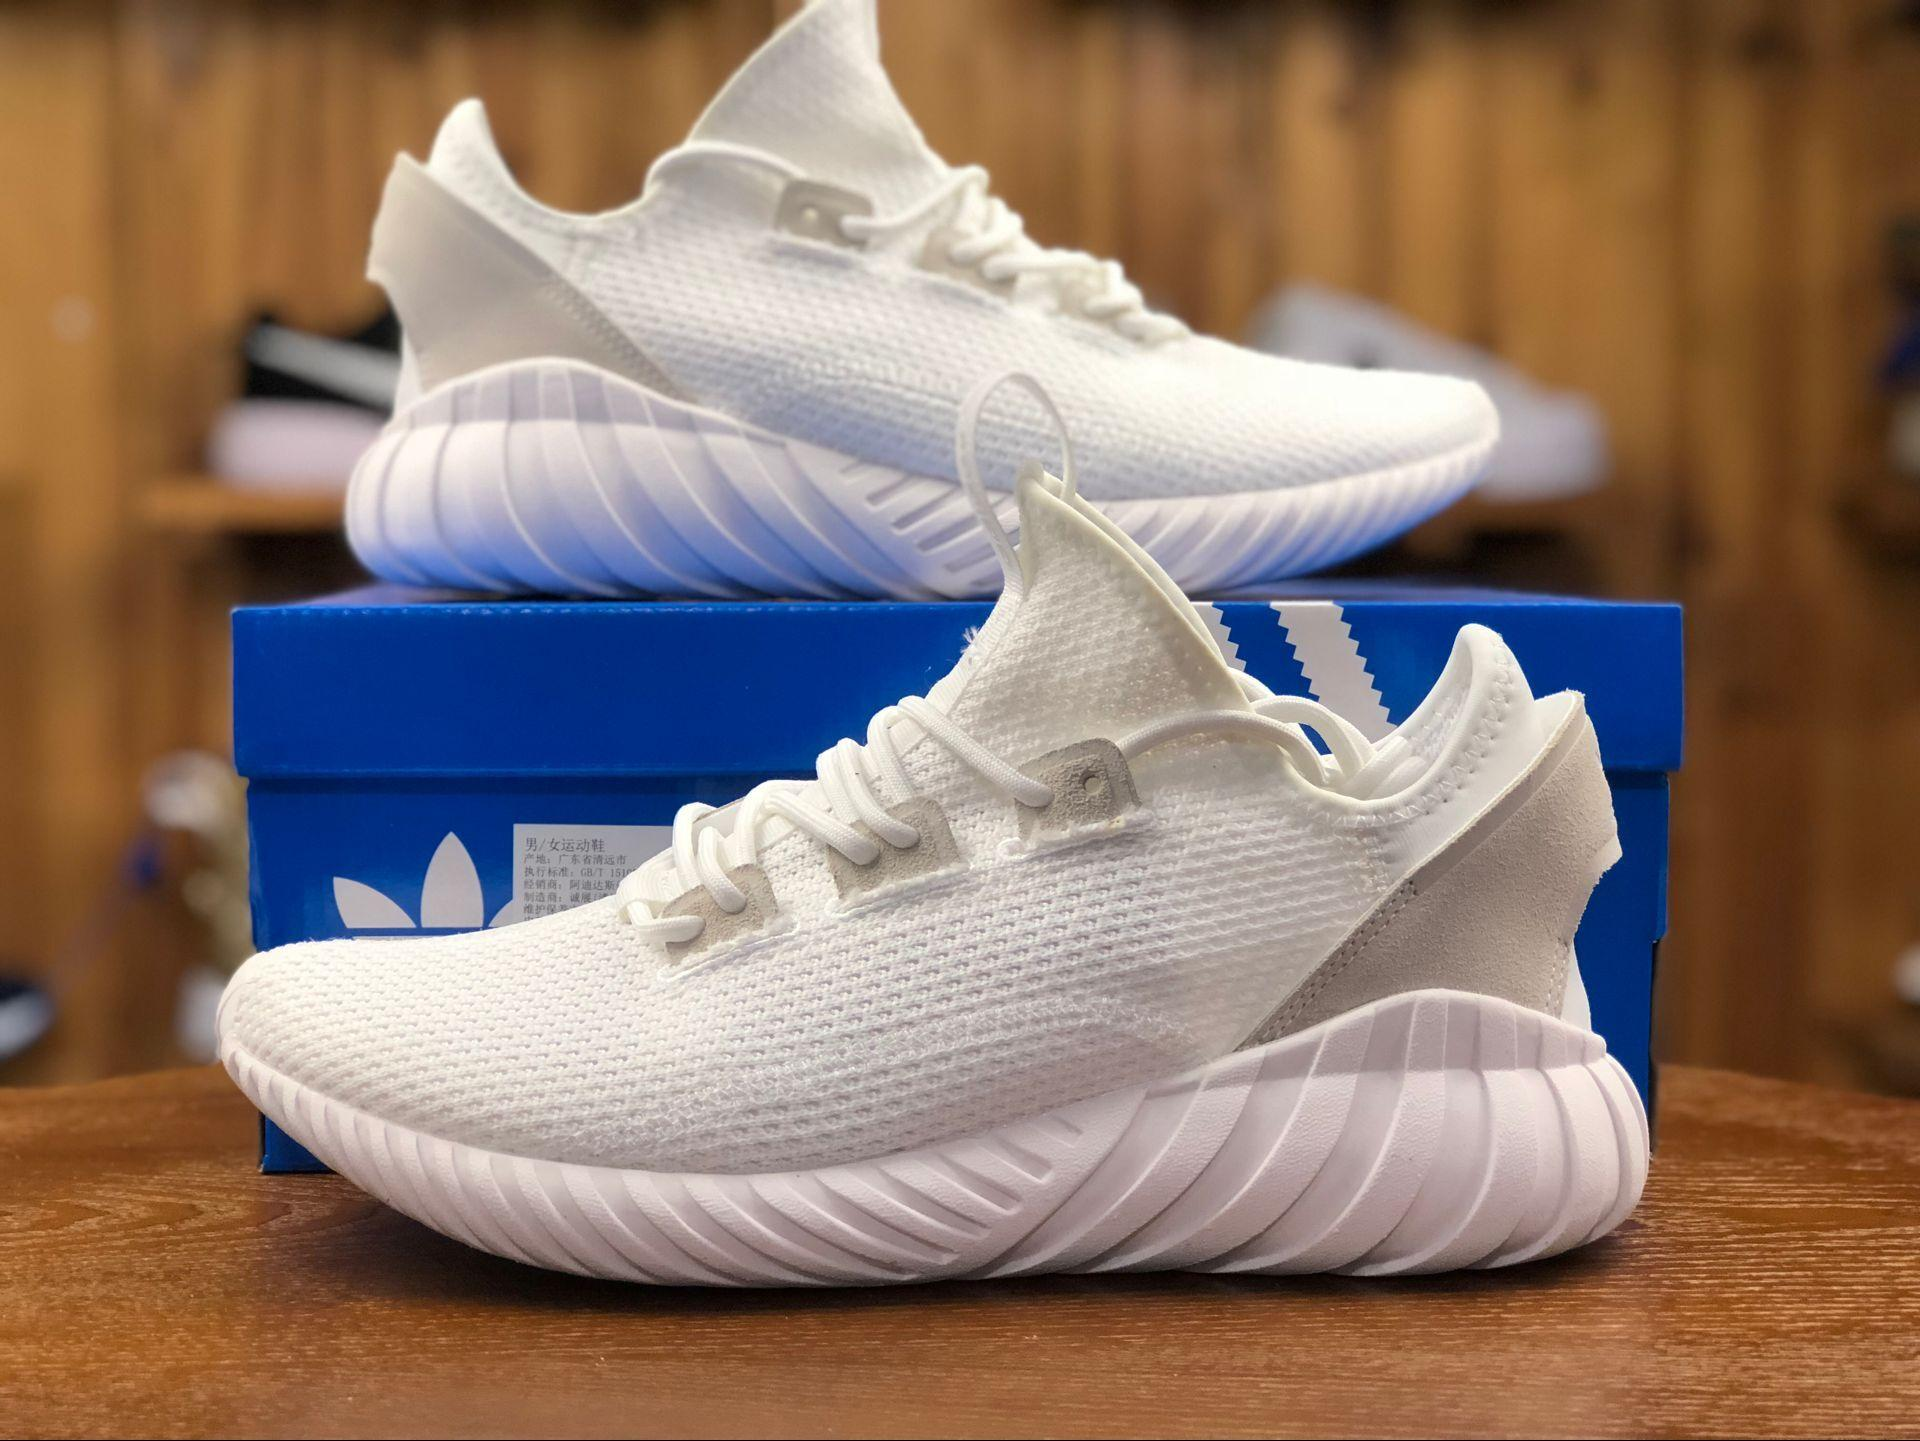 pretty nice 4a2fa b0696 2018 Adidas Originals Tubular Doom Sock BY3566 Women and Men Casual Shoes  White